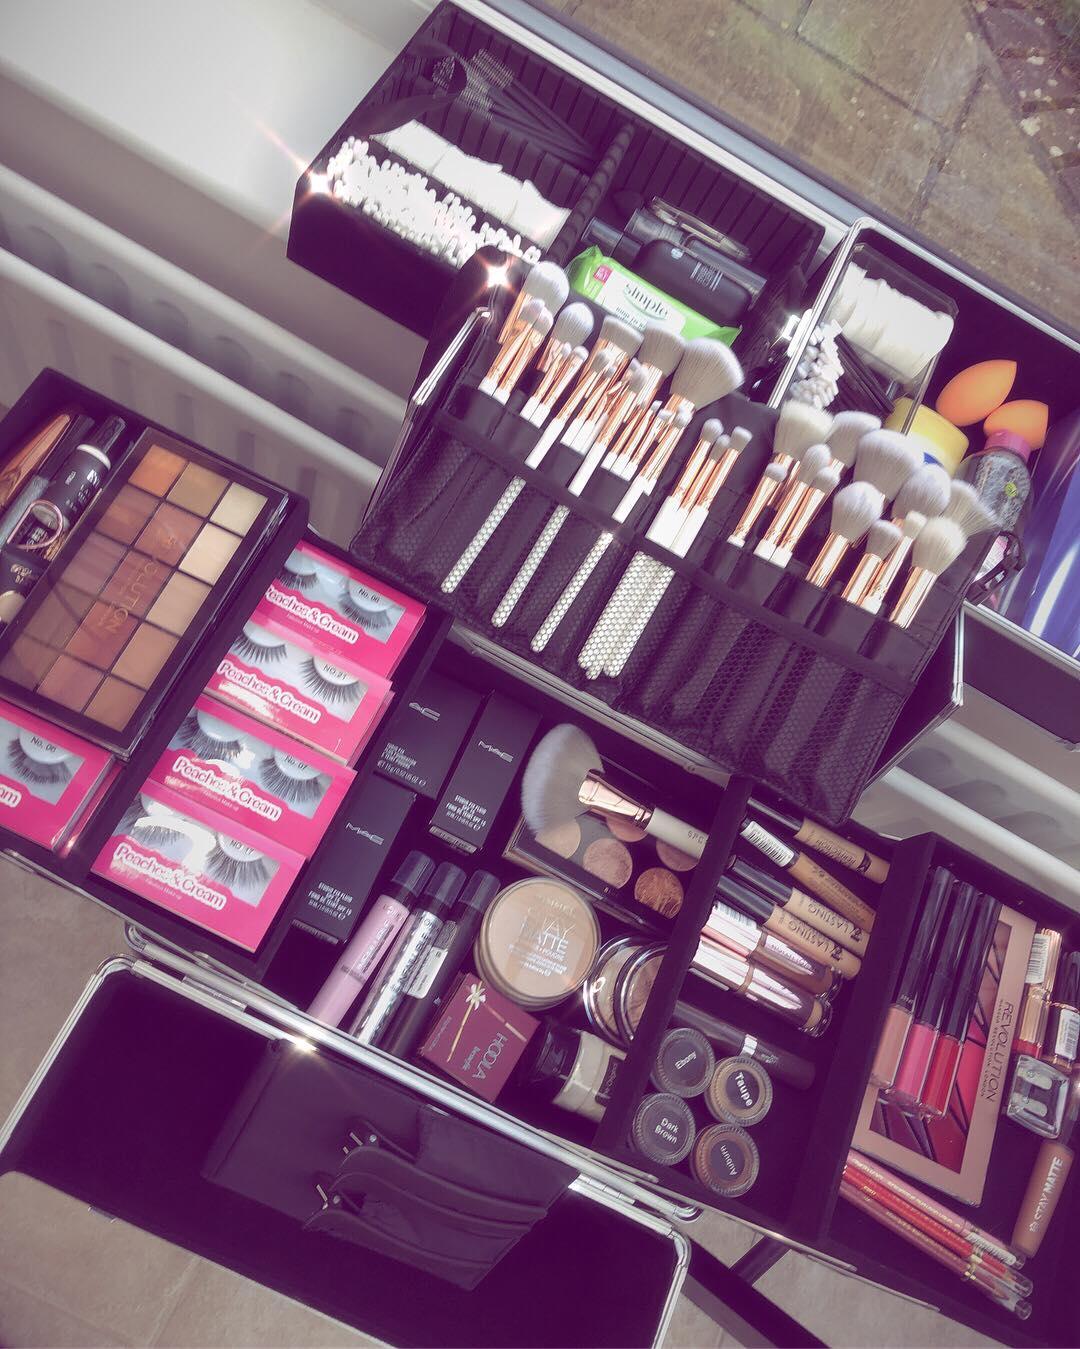 , 'Makeup by Chloe Aitken', Skem News - The Top Source for Skelmersdale News